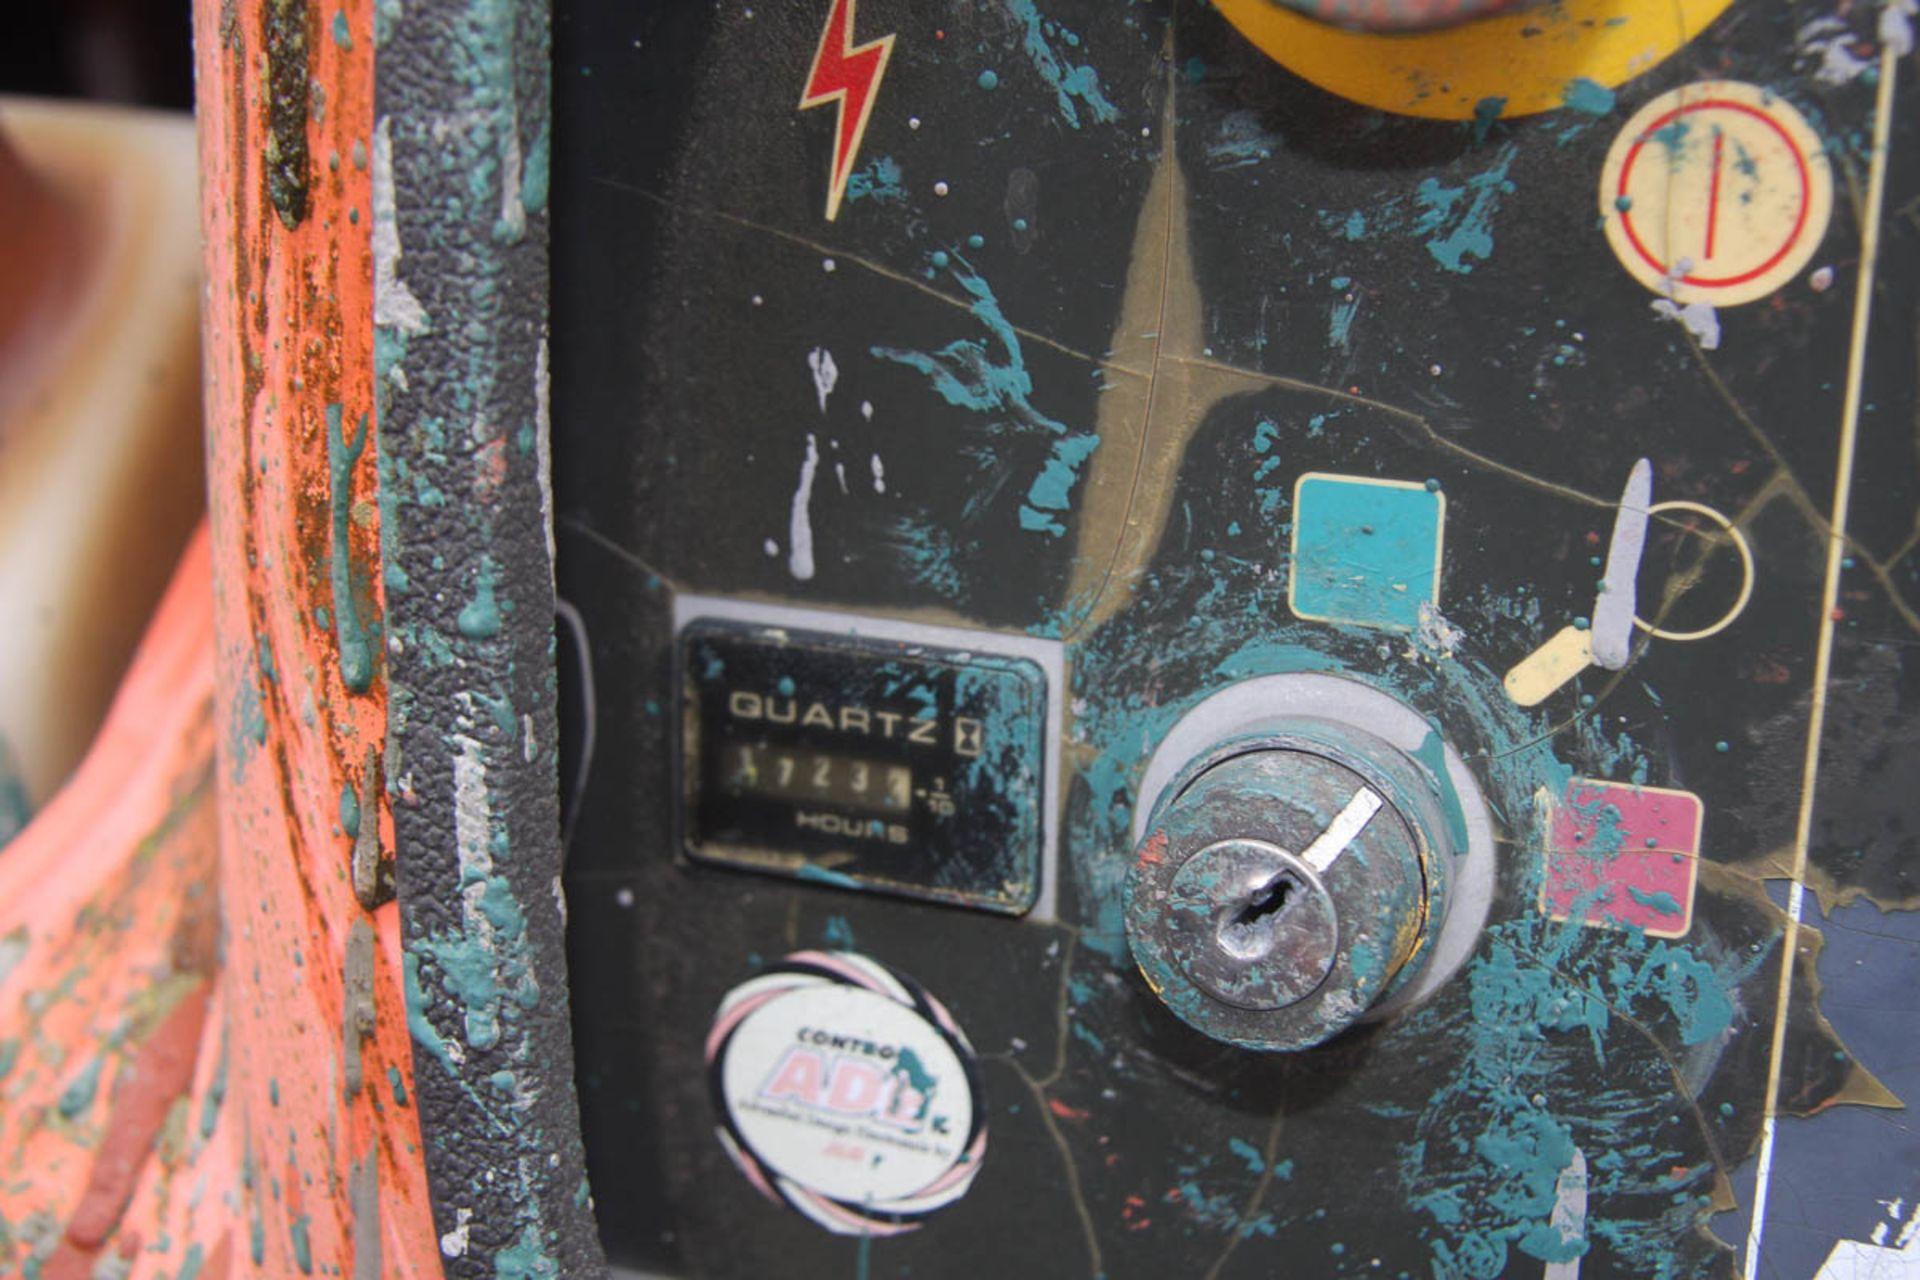 2002 JLG 450AJ SEIRES II BOOM LIFT, DIESEL, WITH 45' MAX HEIGHT, 500# CAPACITY, 24' HORIZONTAL - Image 9 of 9